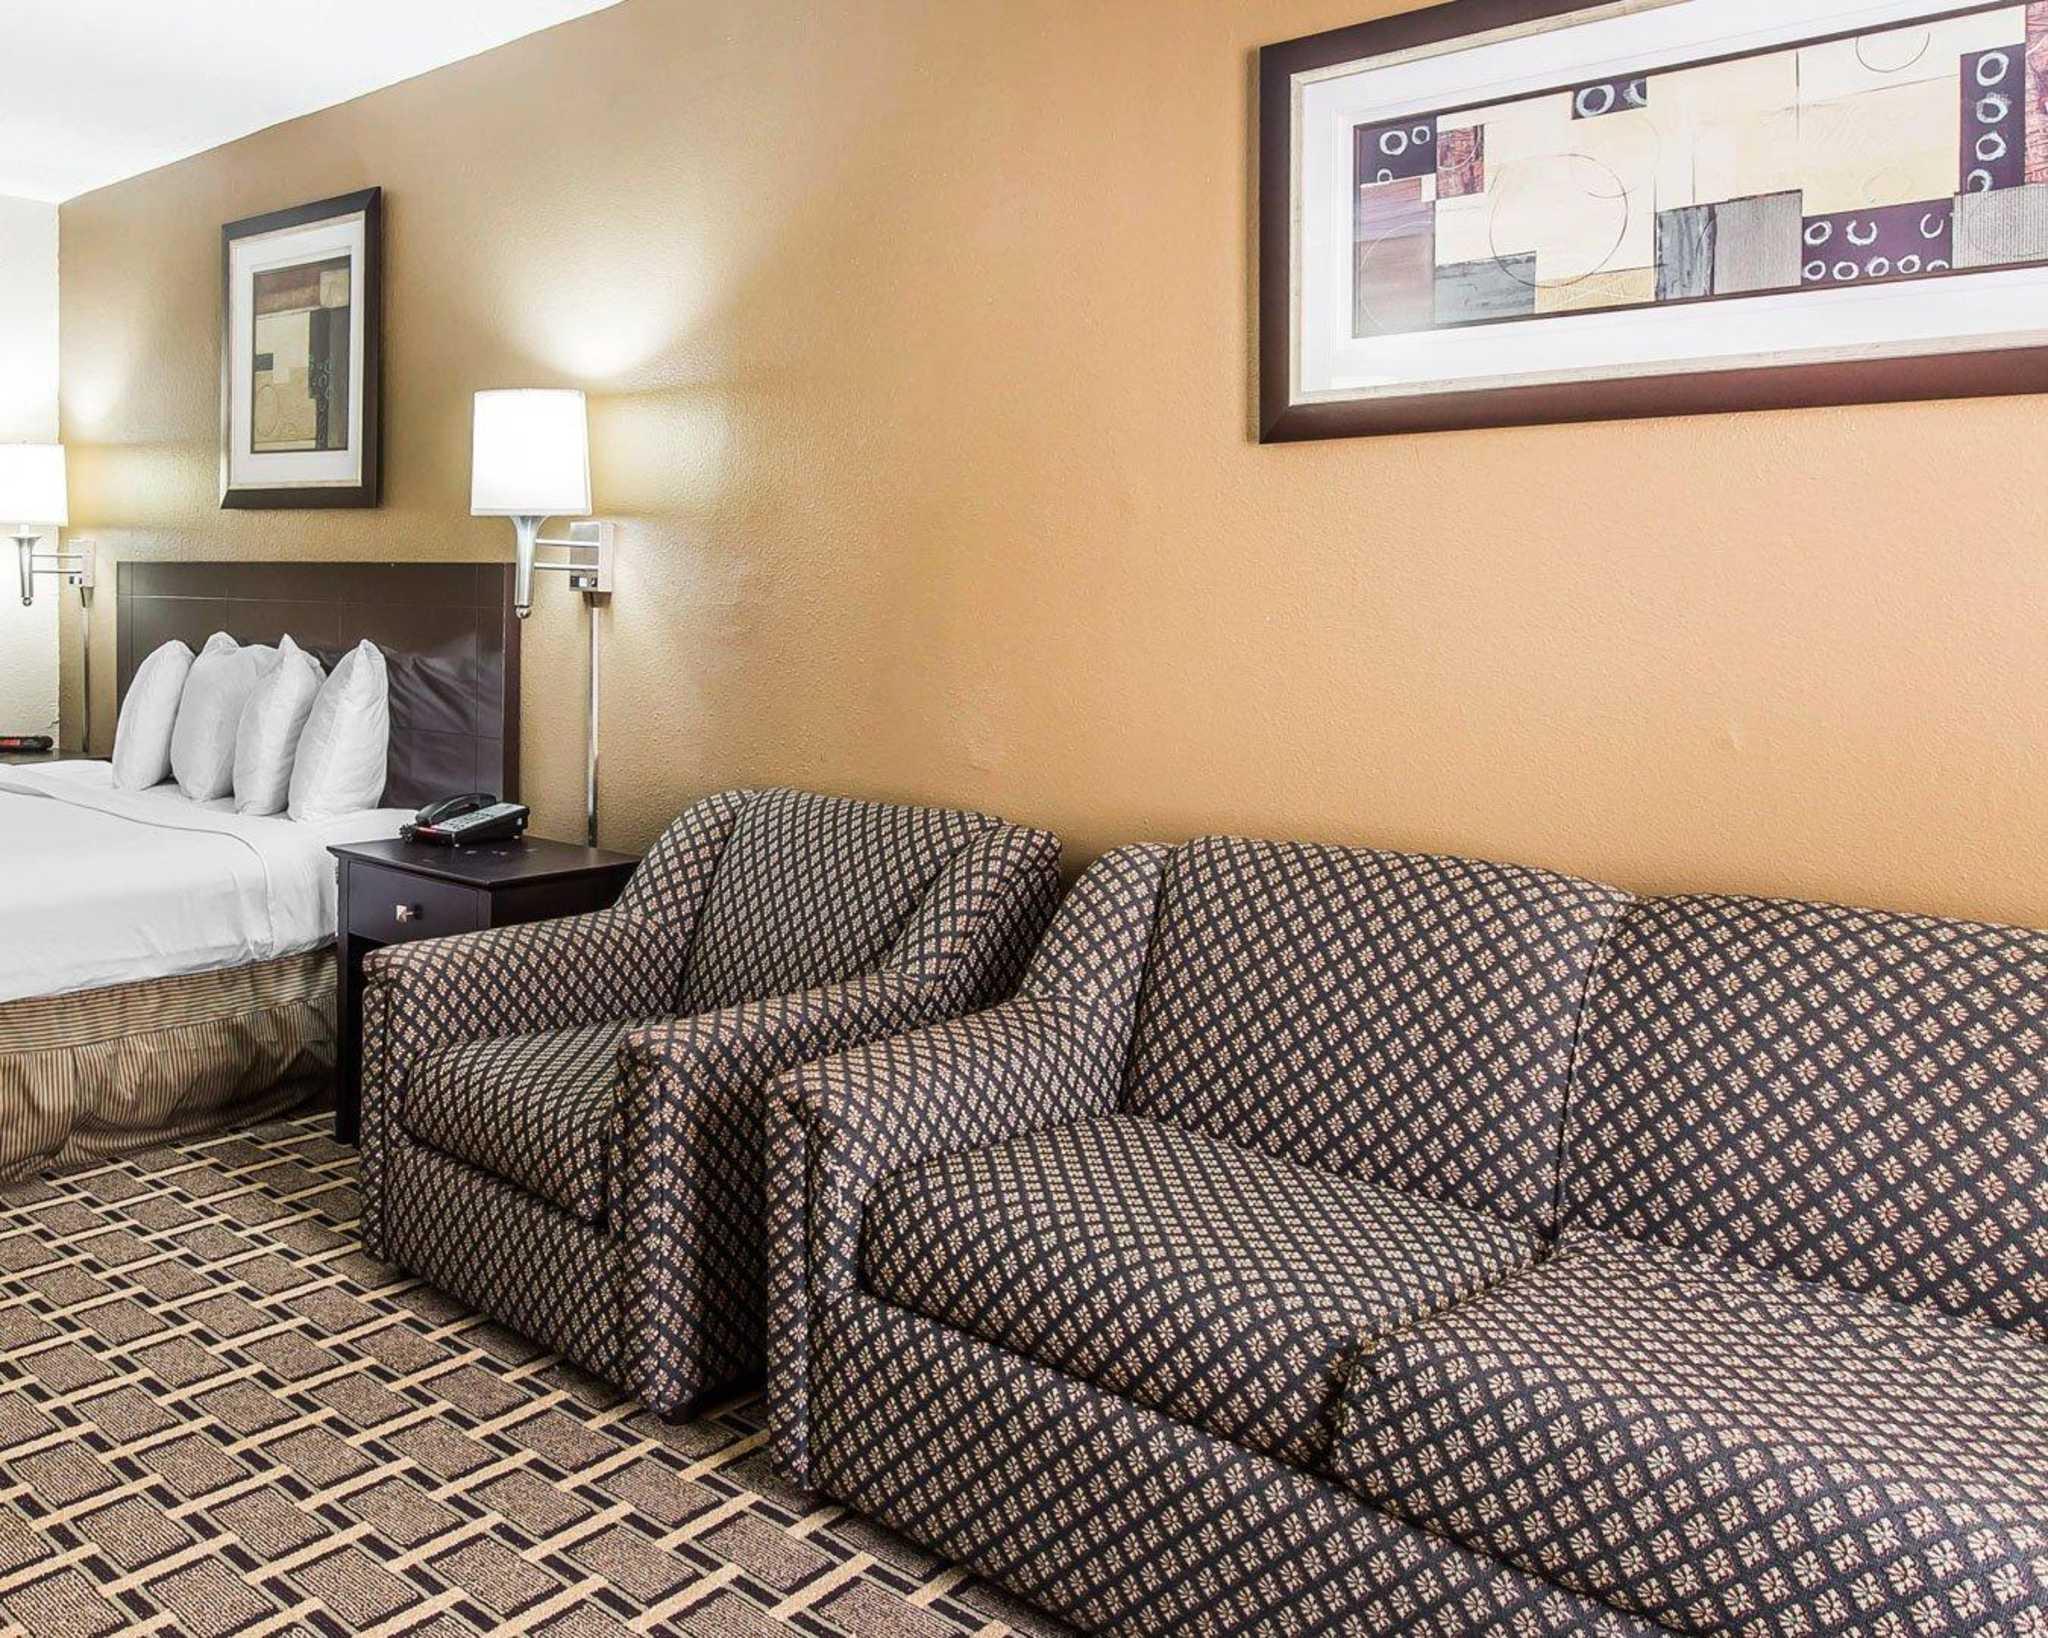 Quality Inn Kingsland image 6